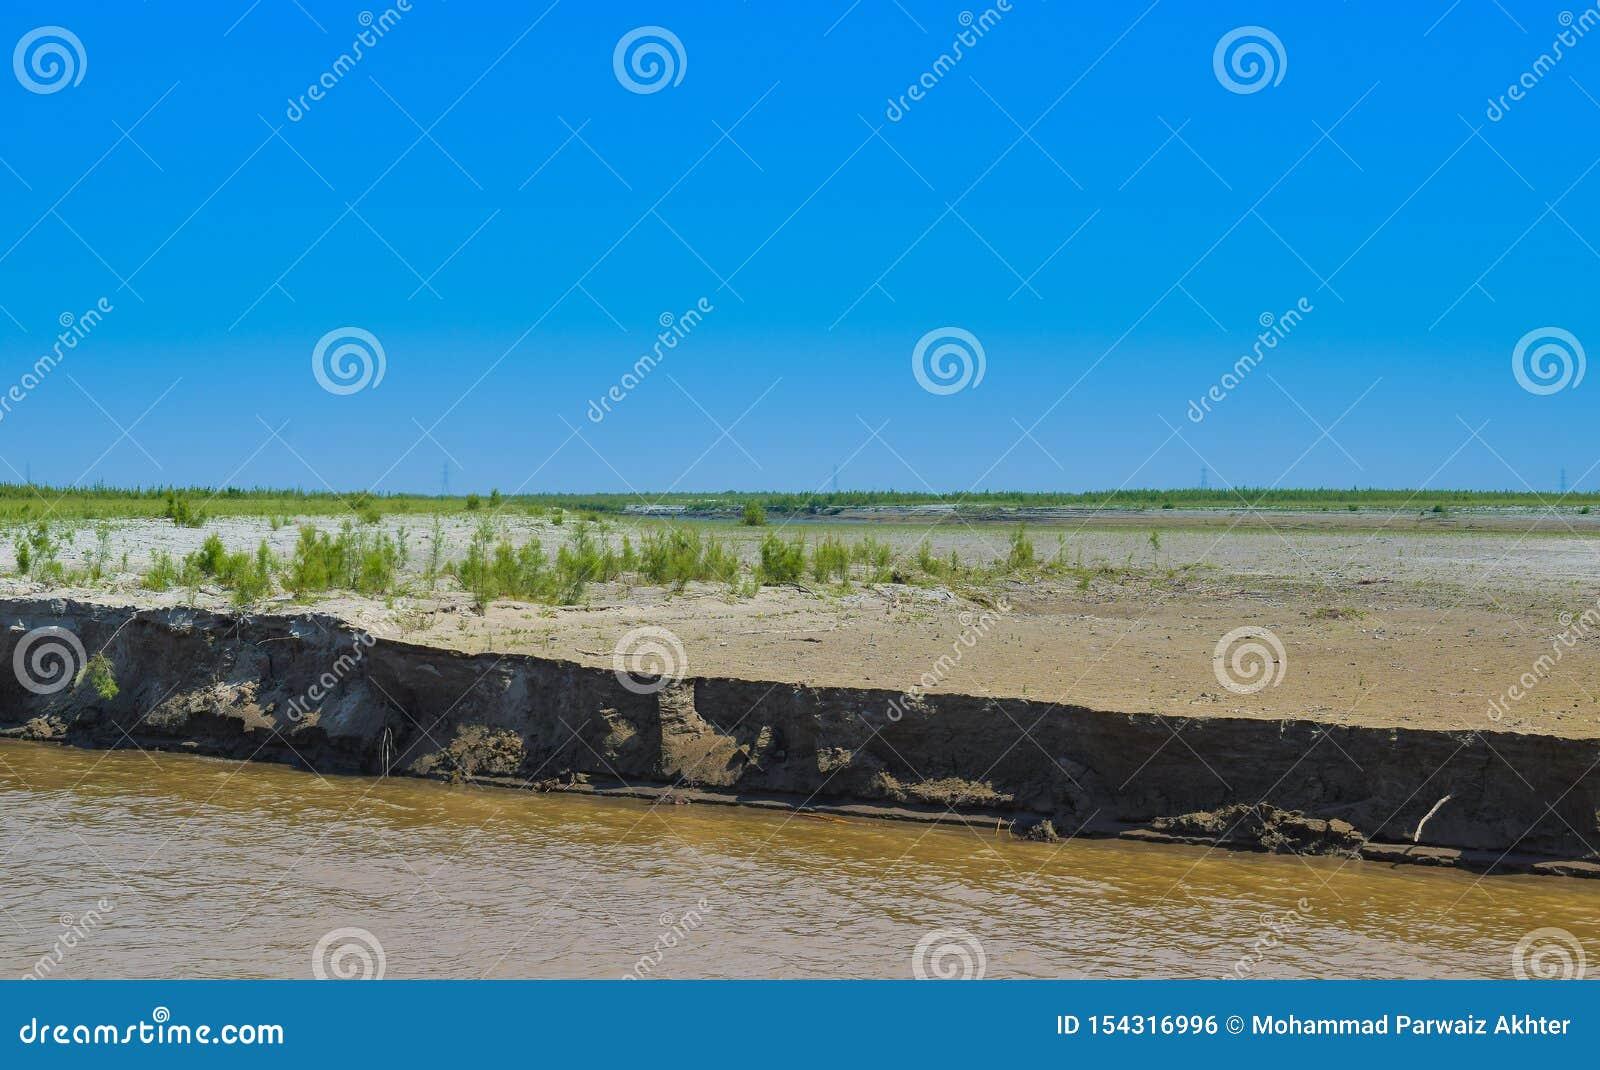 Piante verdi sulla banca del fiume indus